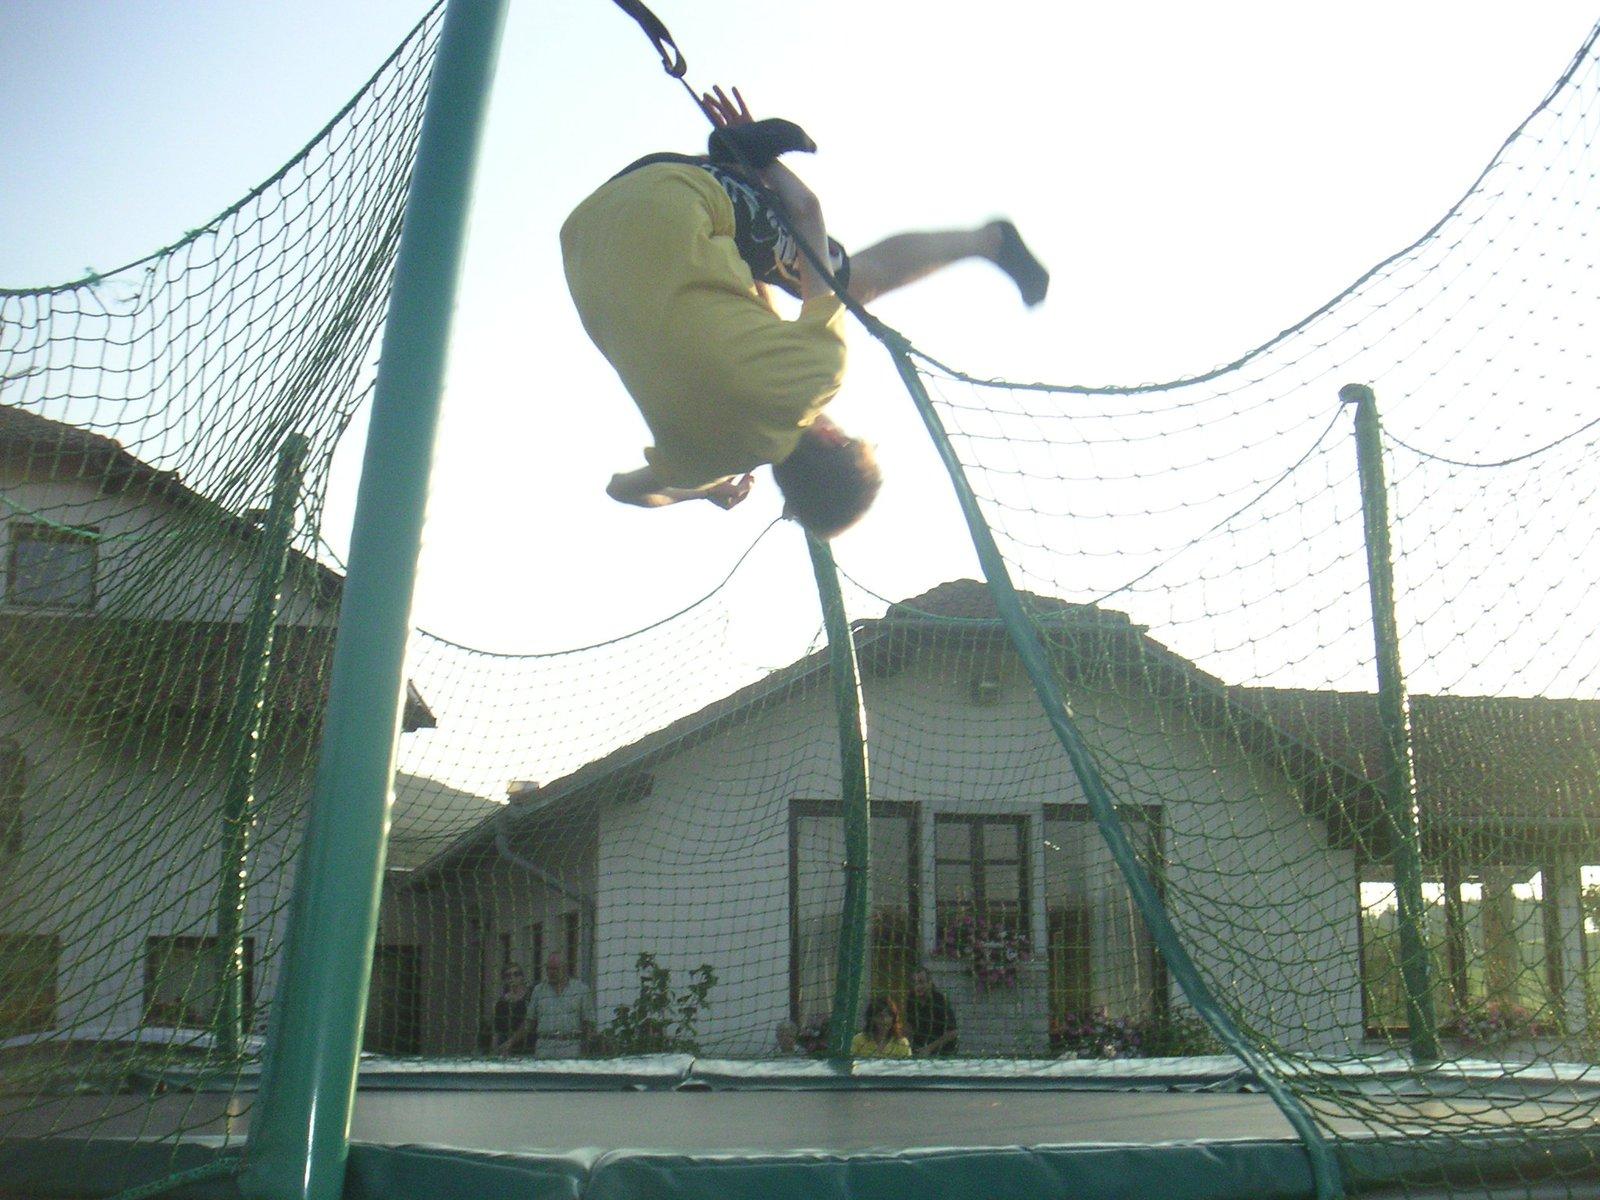 Trampoline Liu-Kang Backflip